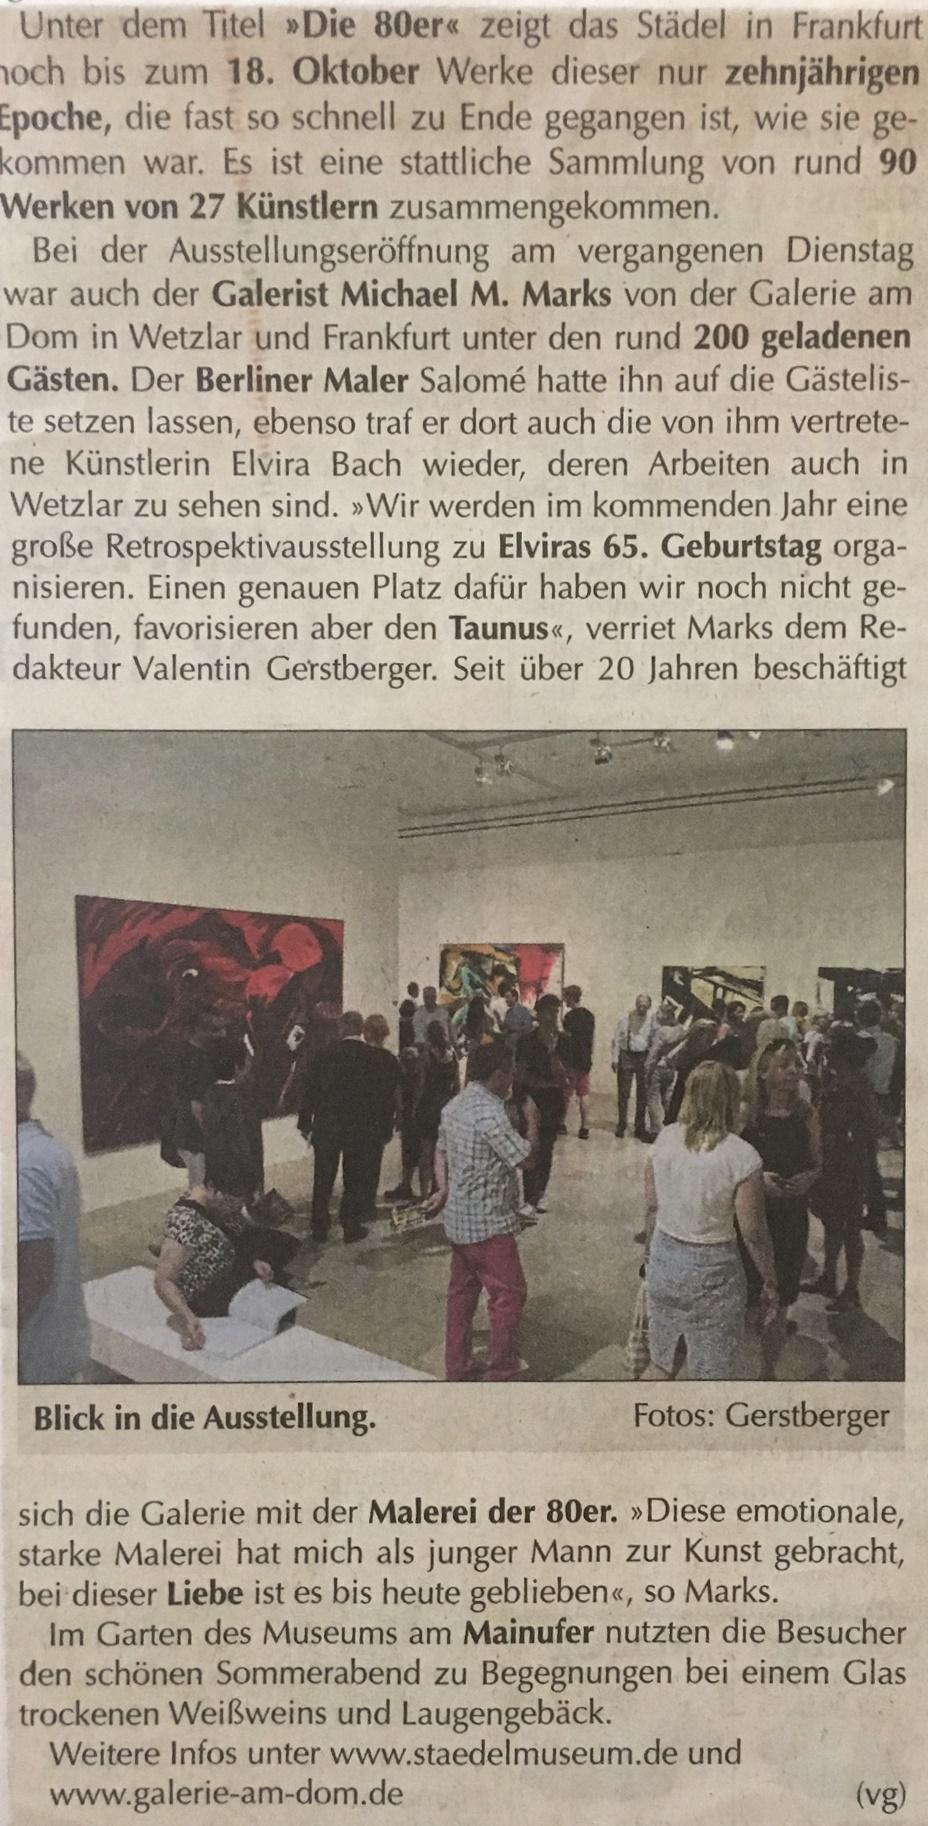 Sonntag-Morgenmagazin-St-del-Elvira-Bach-26-7-2015-a